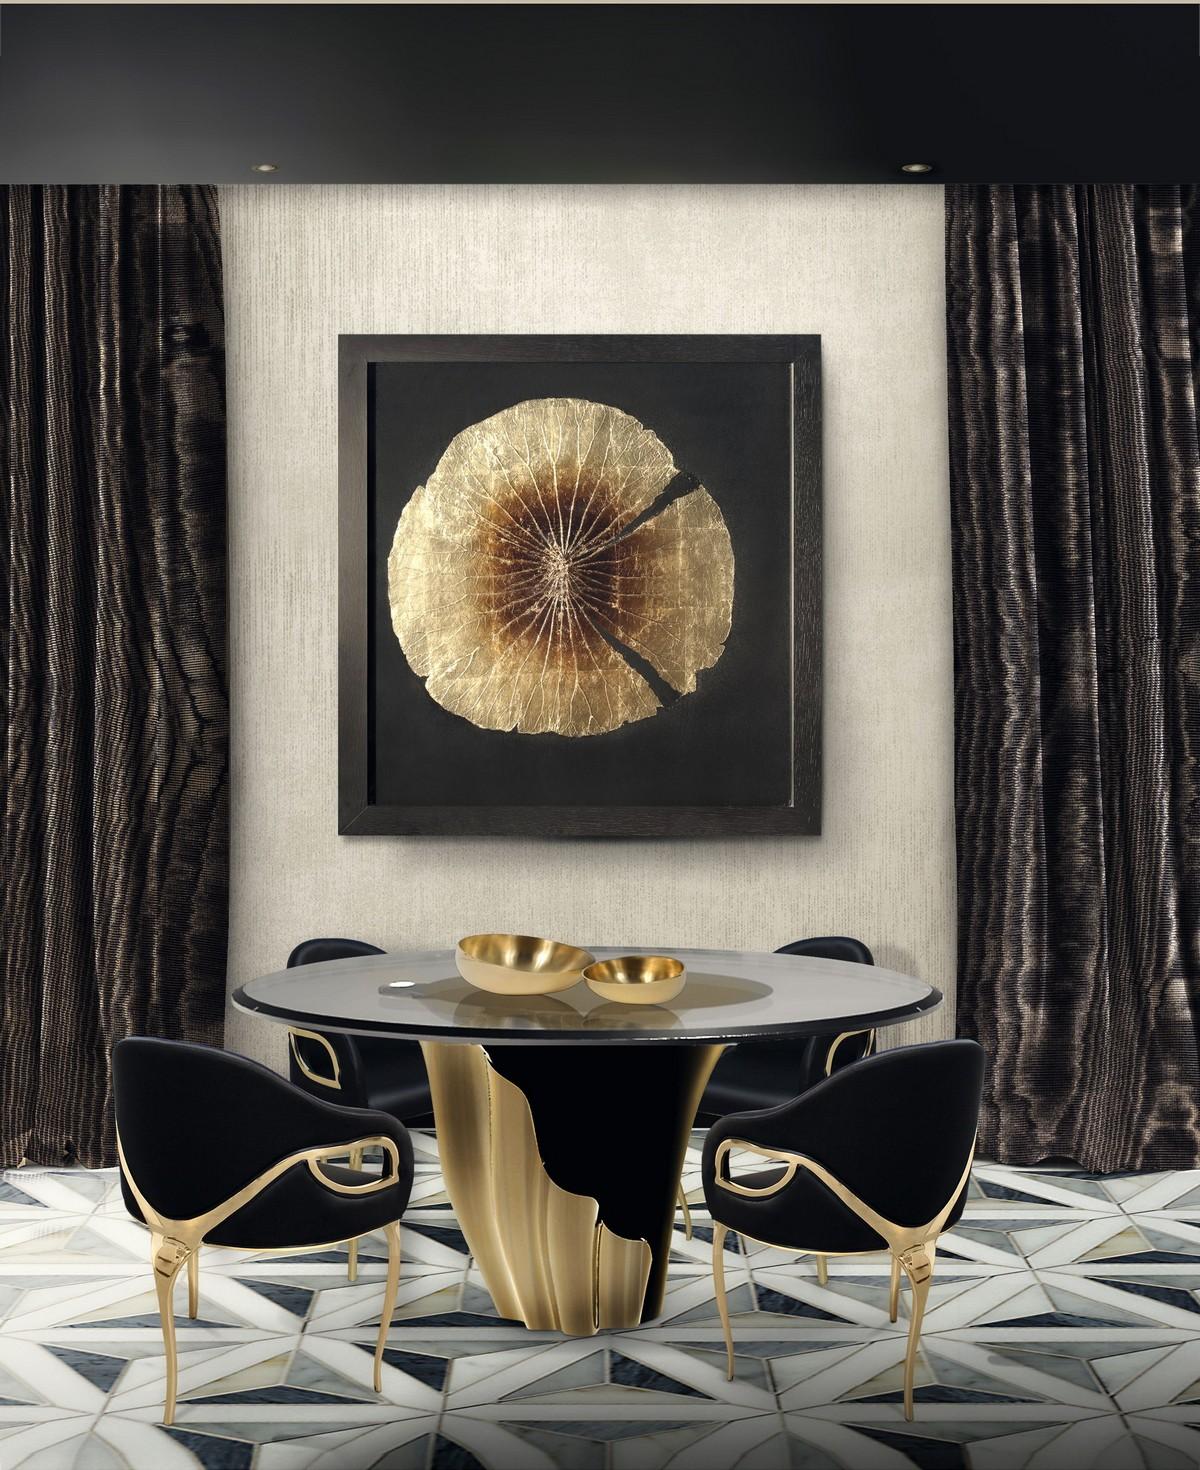 Awe-inspiring Dining Room Decor Inspirations (Part III) dining room decor Awe-inspiring Dining Room Decor Inspirations (Part III) kkkkk